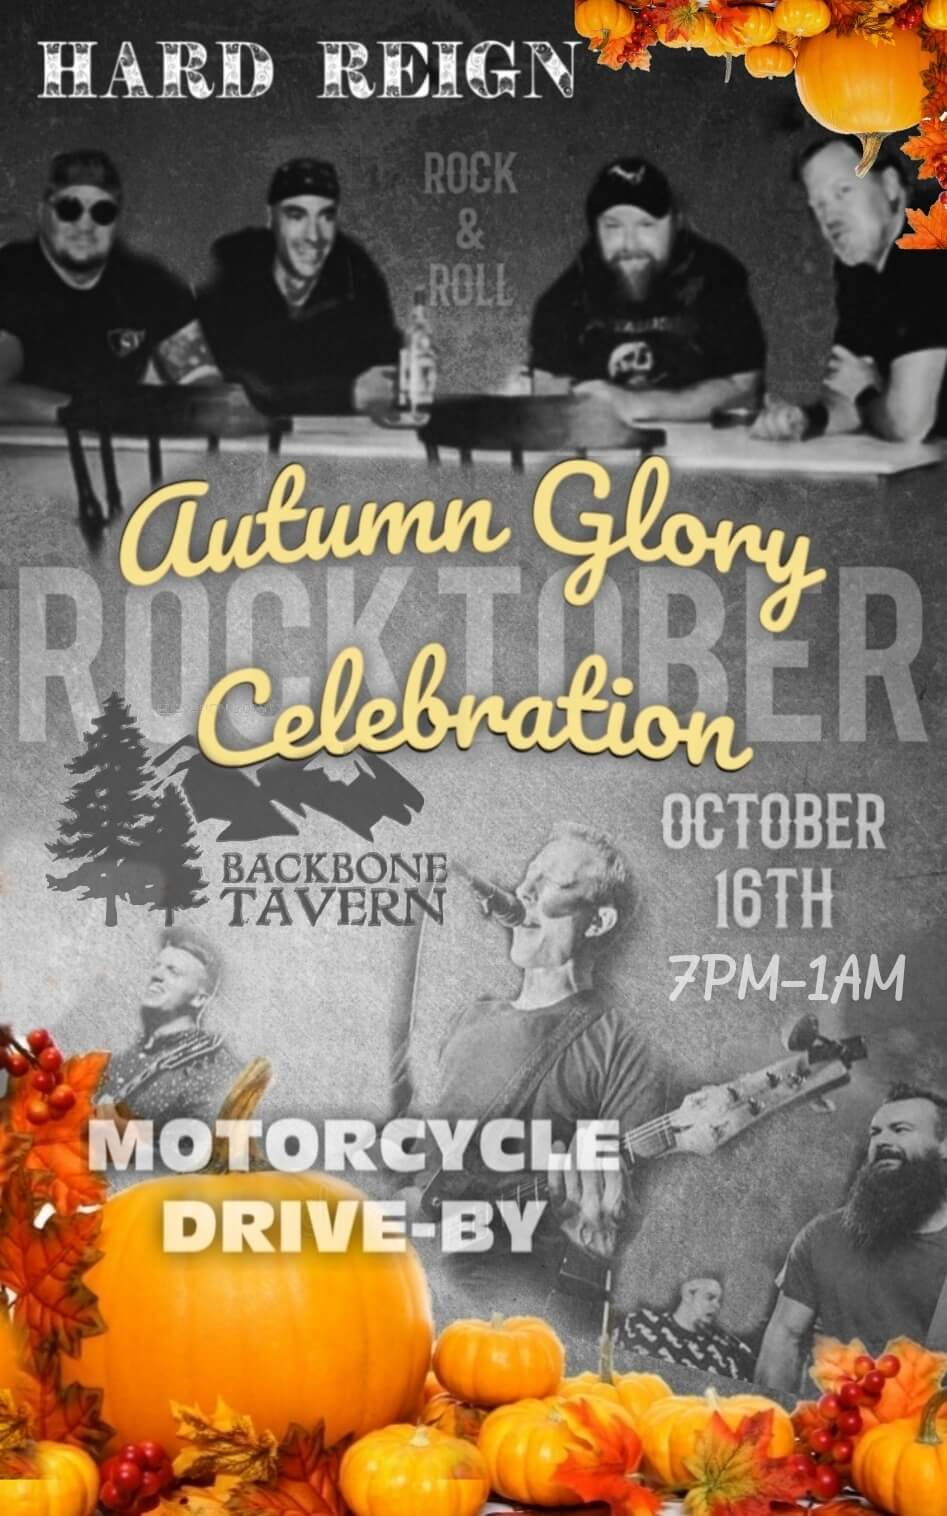 Backbone Tavern: Autumn Glory Celebration